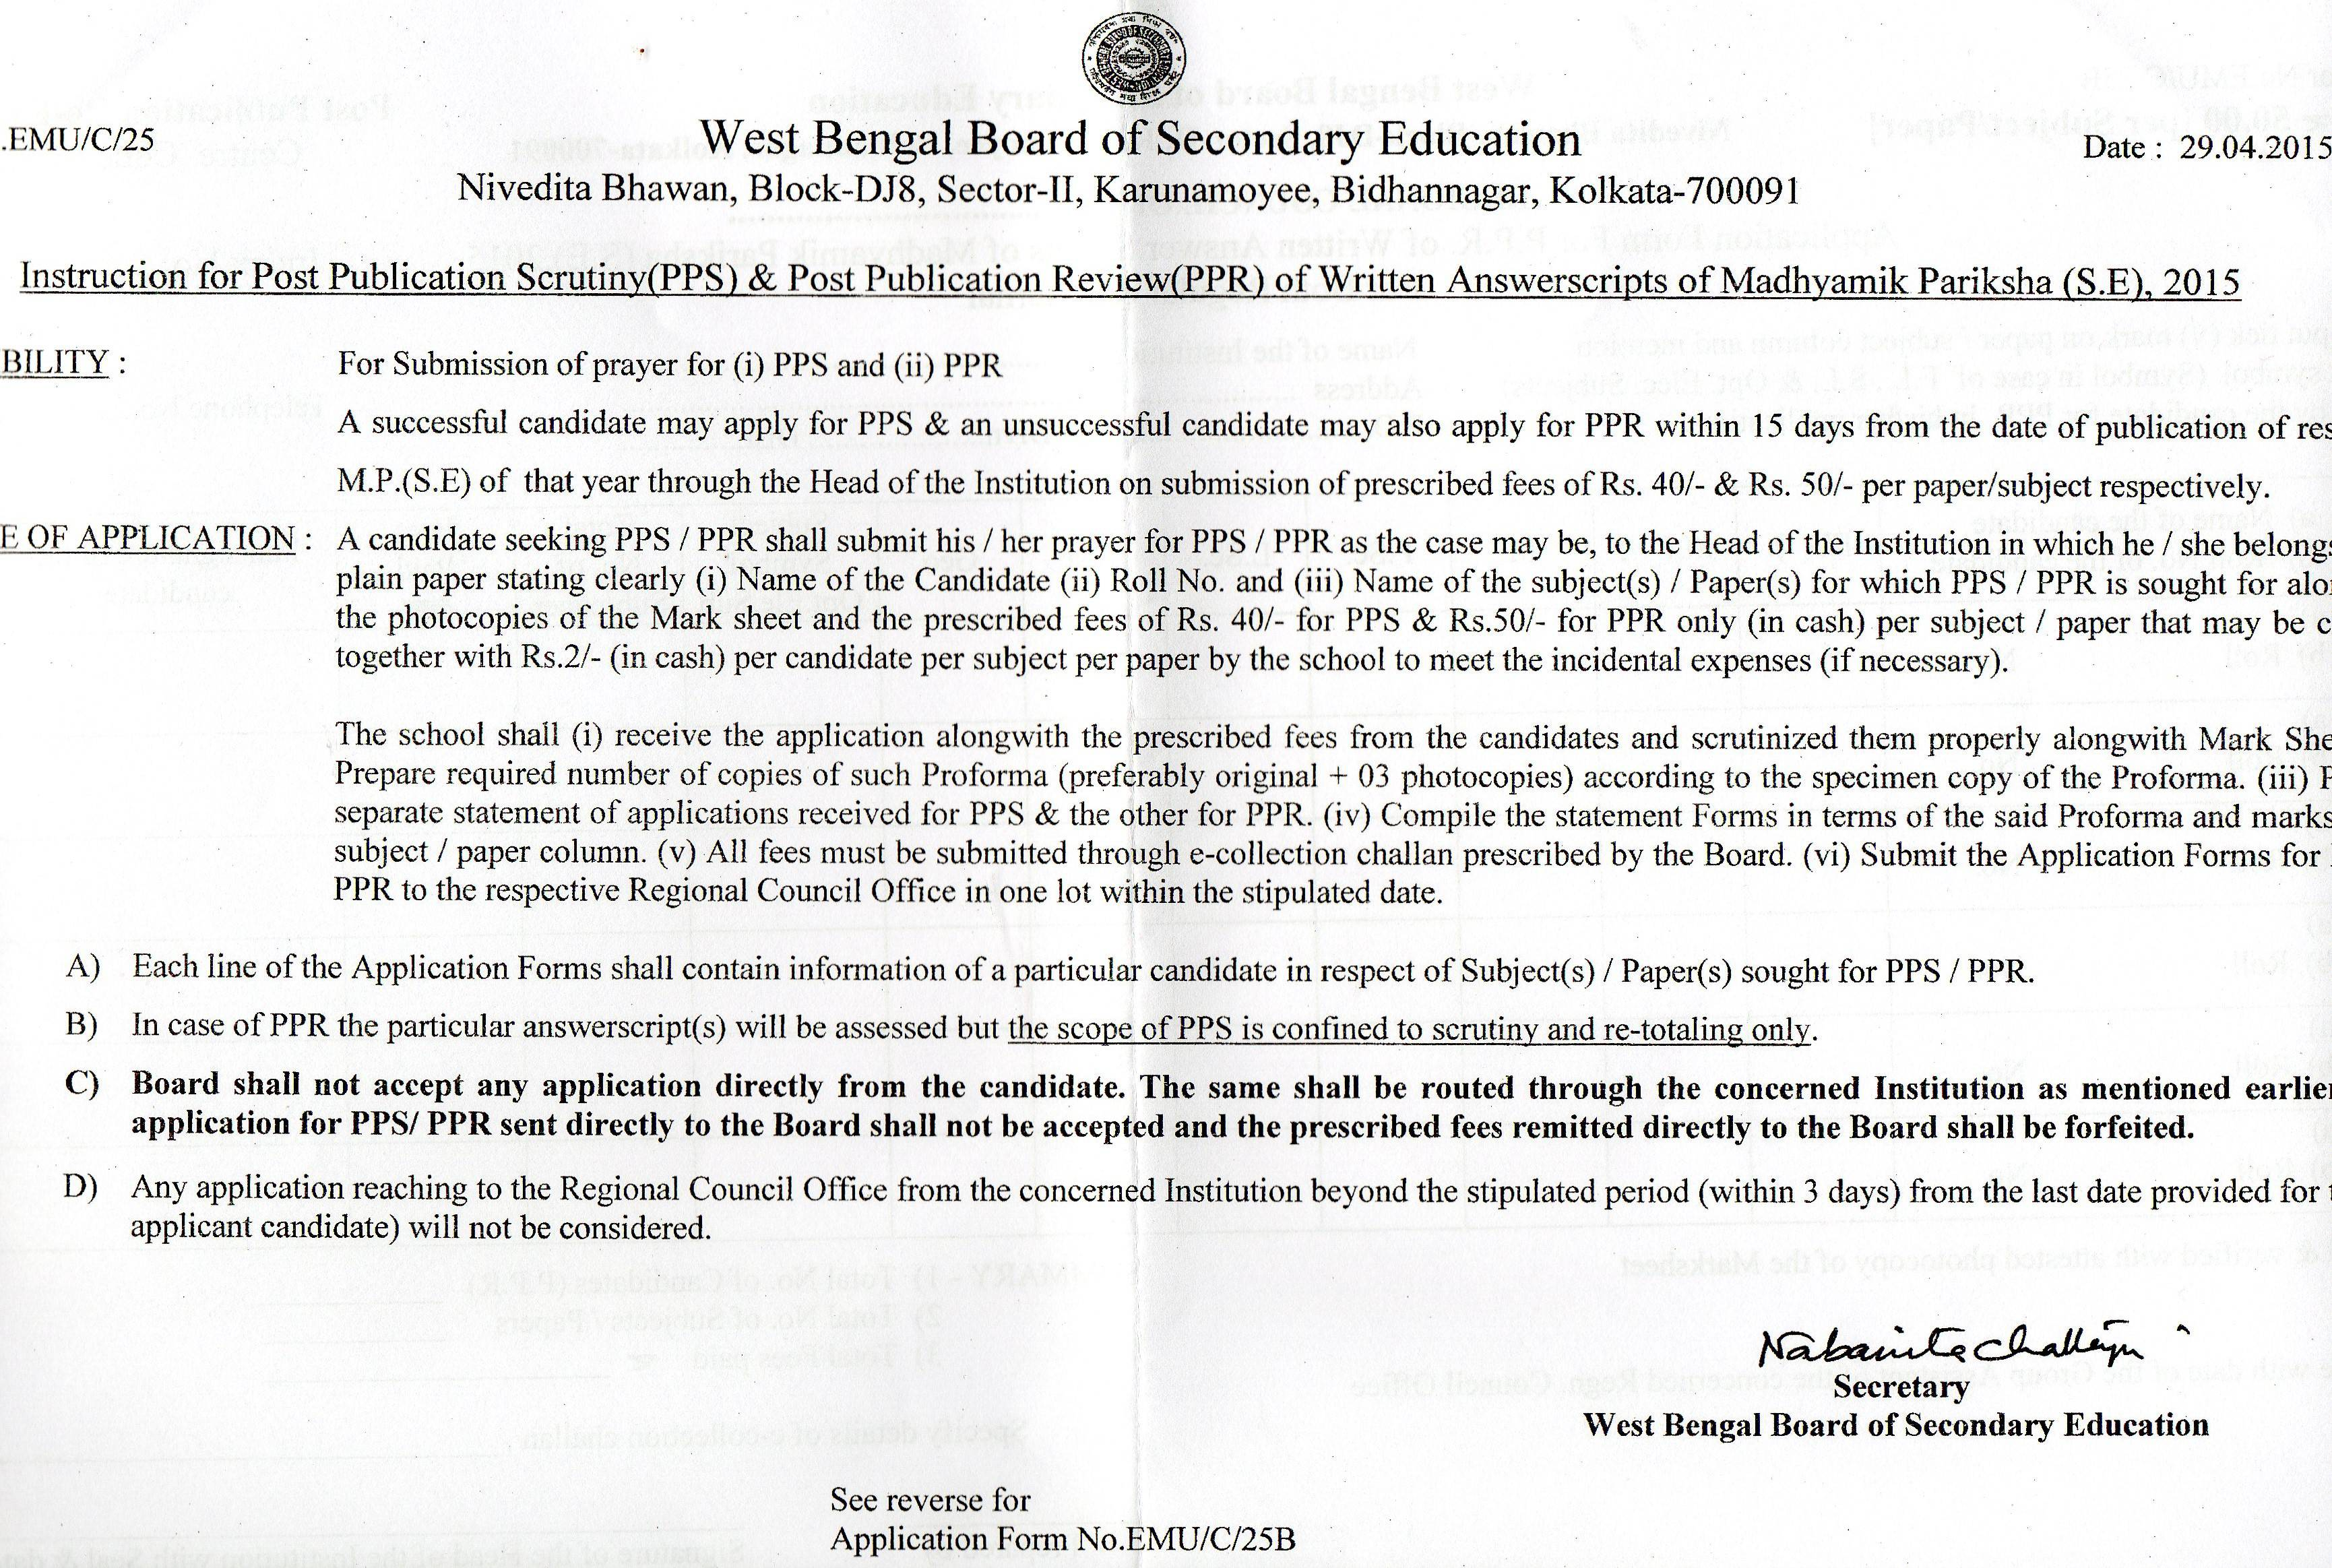 PPS/ PPR of Answer scripts of Madhyamik Pariksha, 2015